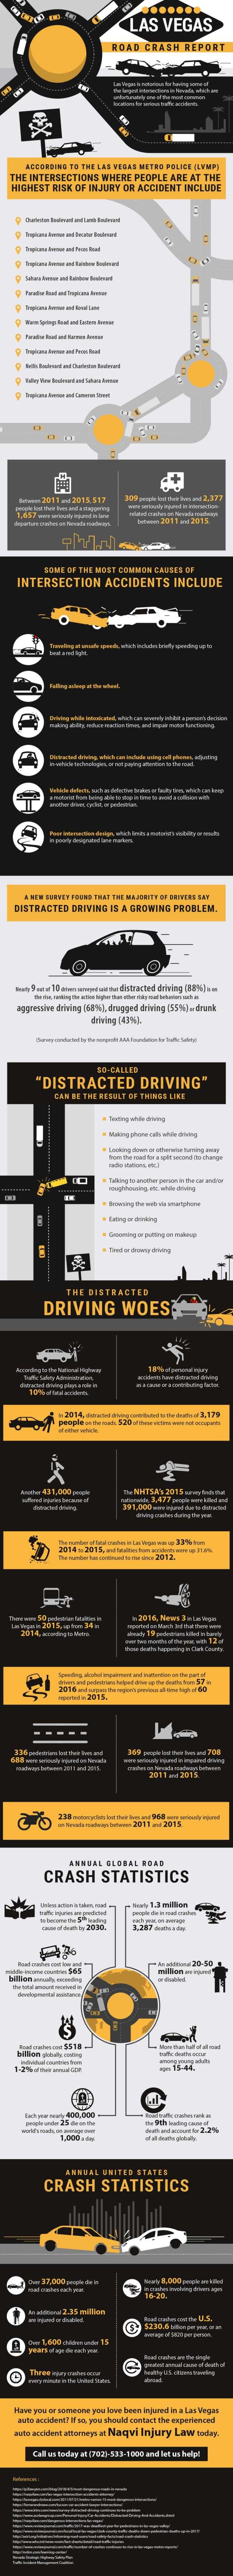 Las-Vegas-Road-Crash-infographic